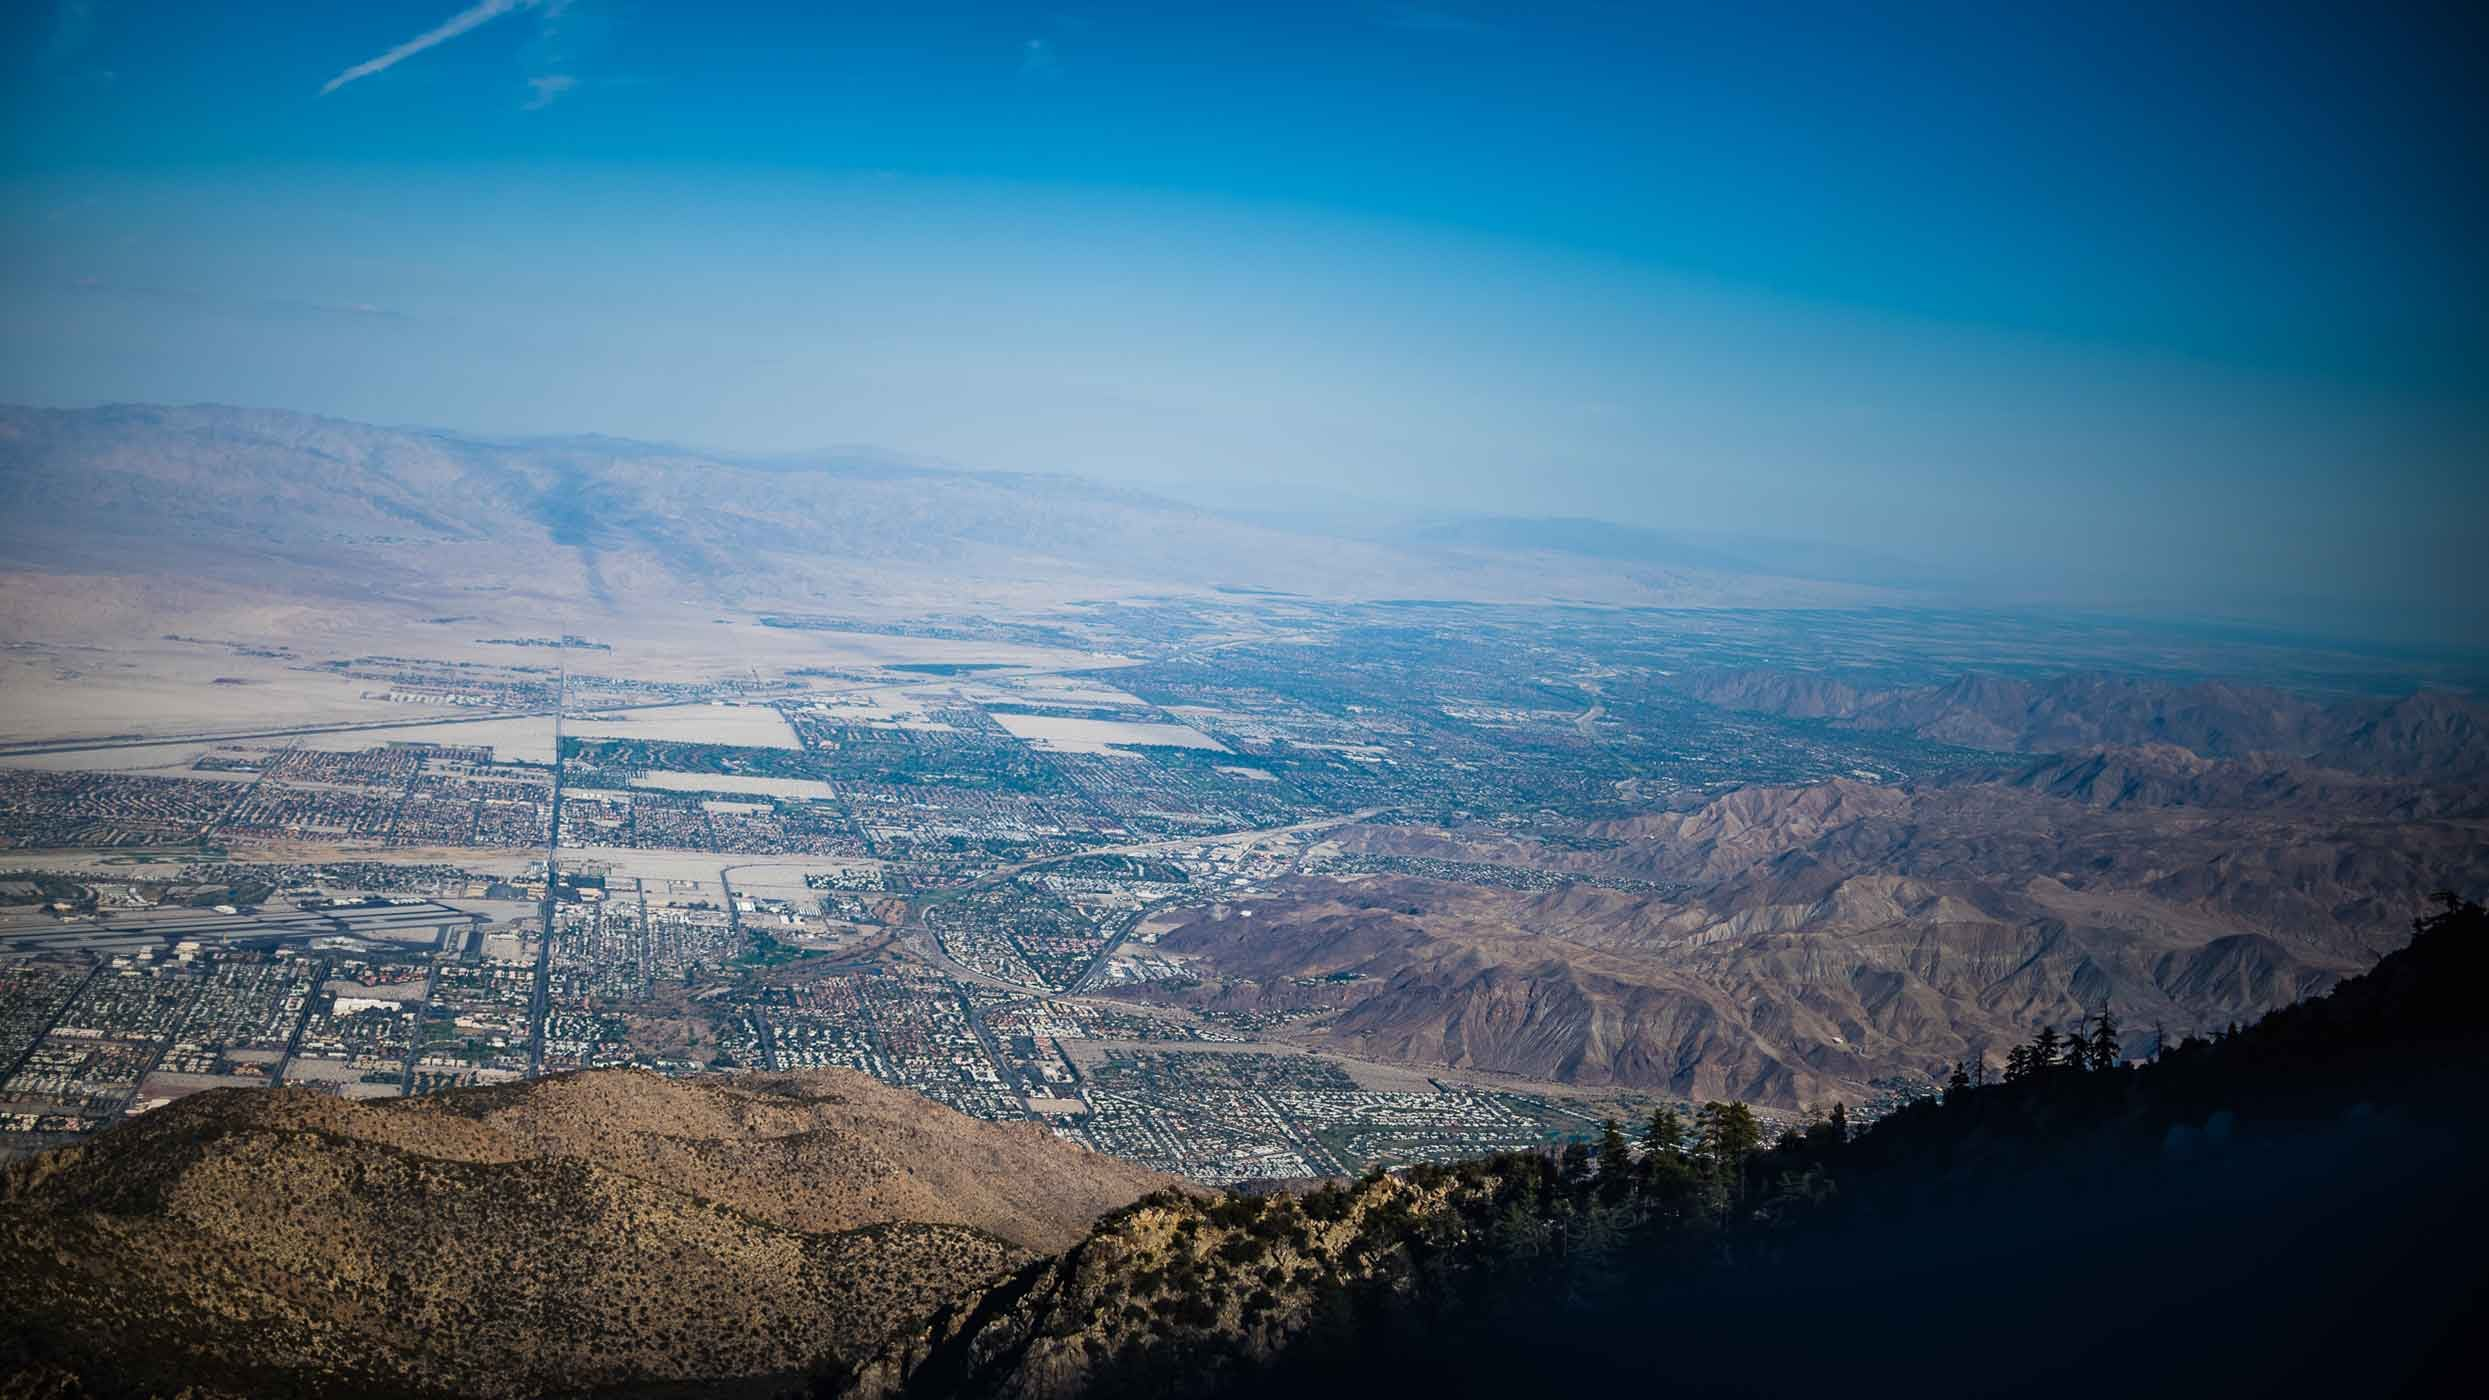 smlPalm-Springs-Aerial-Tramway---Sept-2015-20.jpg